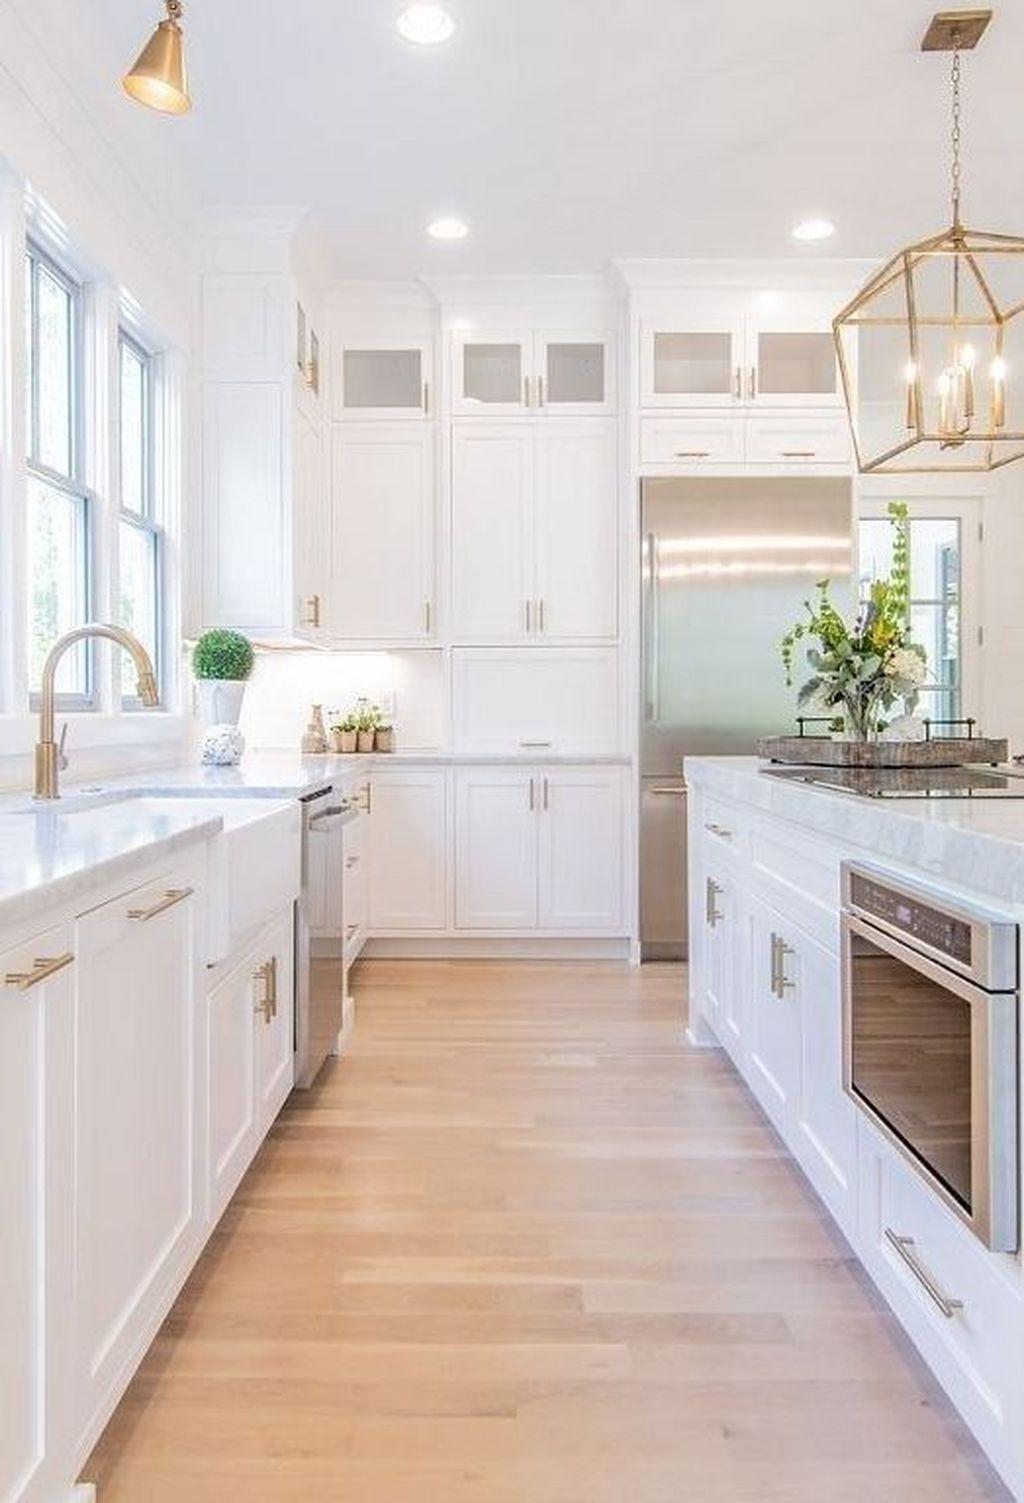 30+ Newest White Kitchen Design Ideas For A Clean And Bright Kitchen  #kitchendesignideas